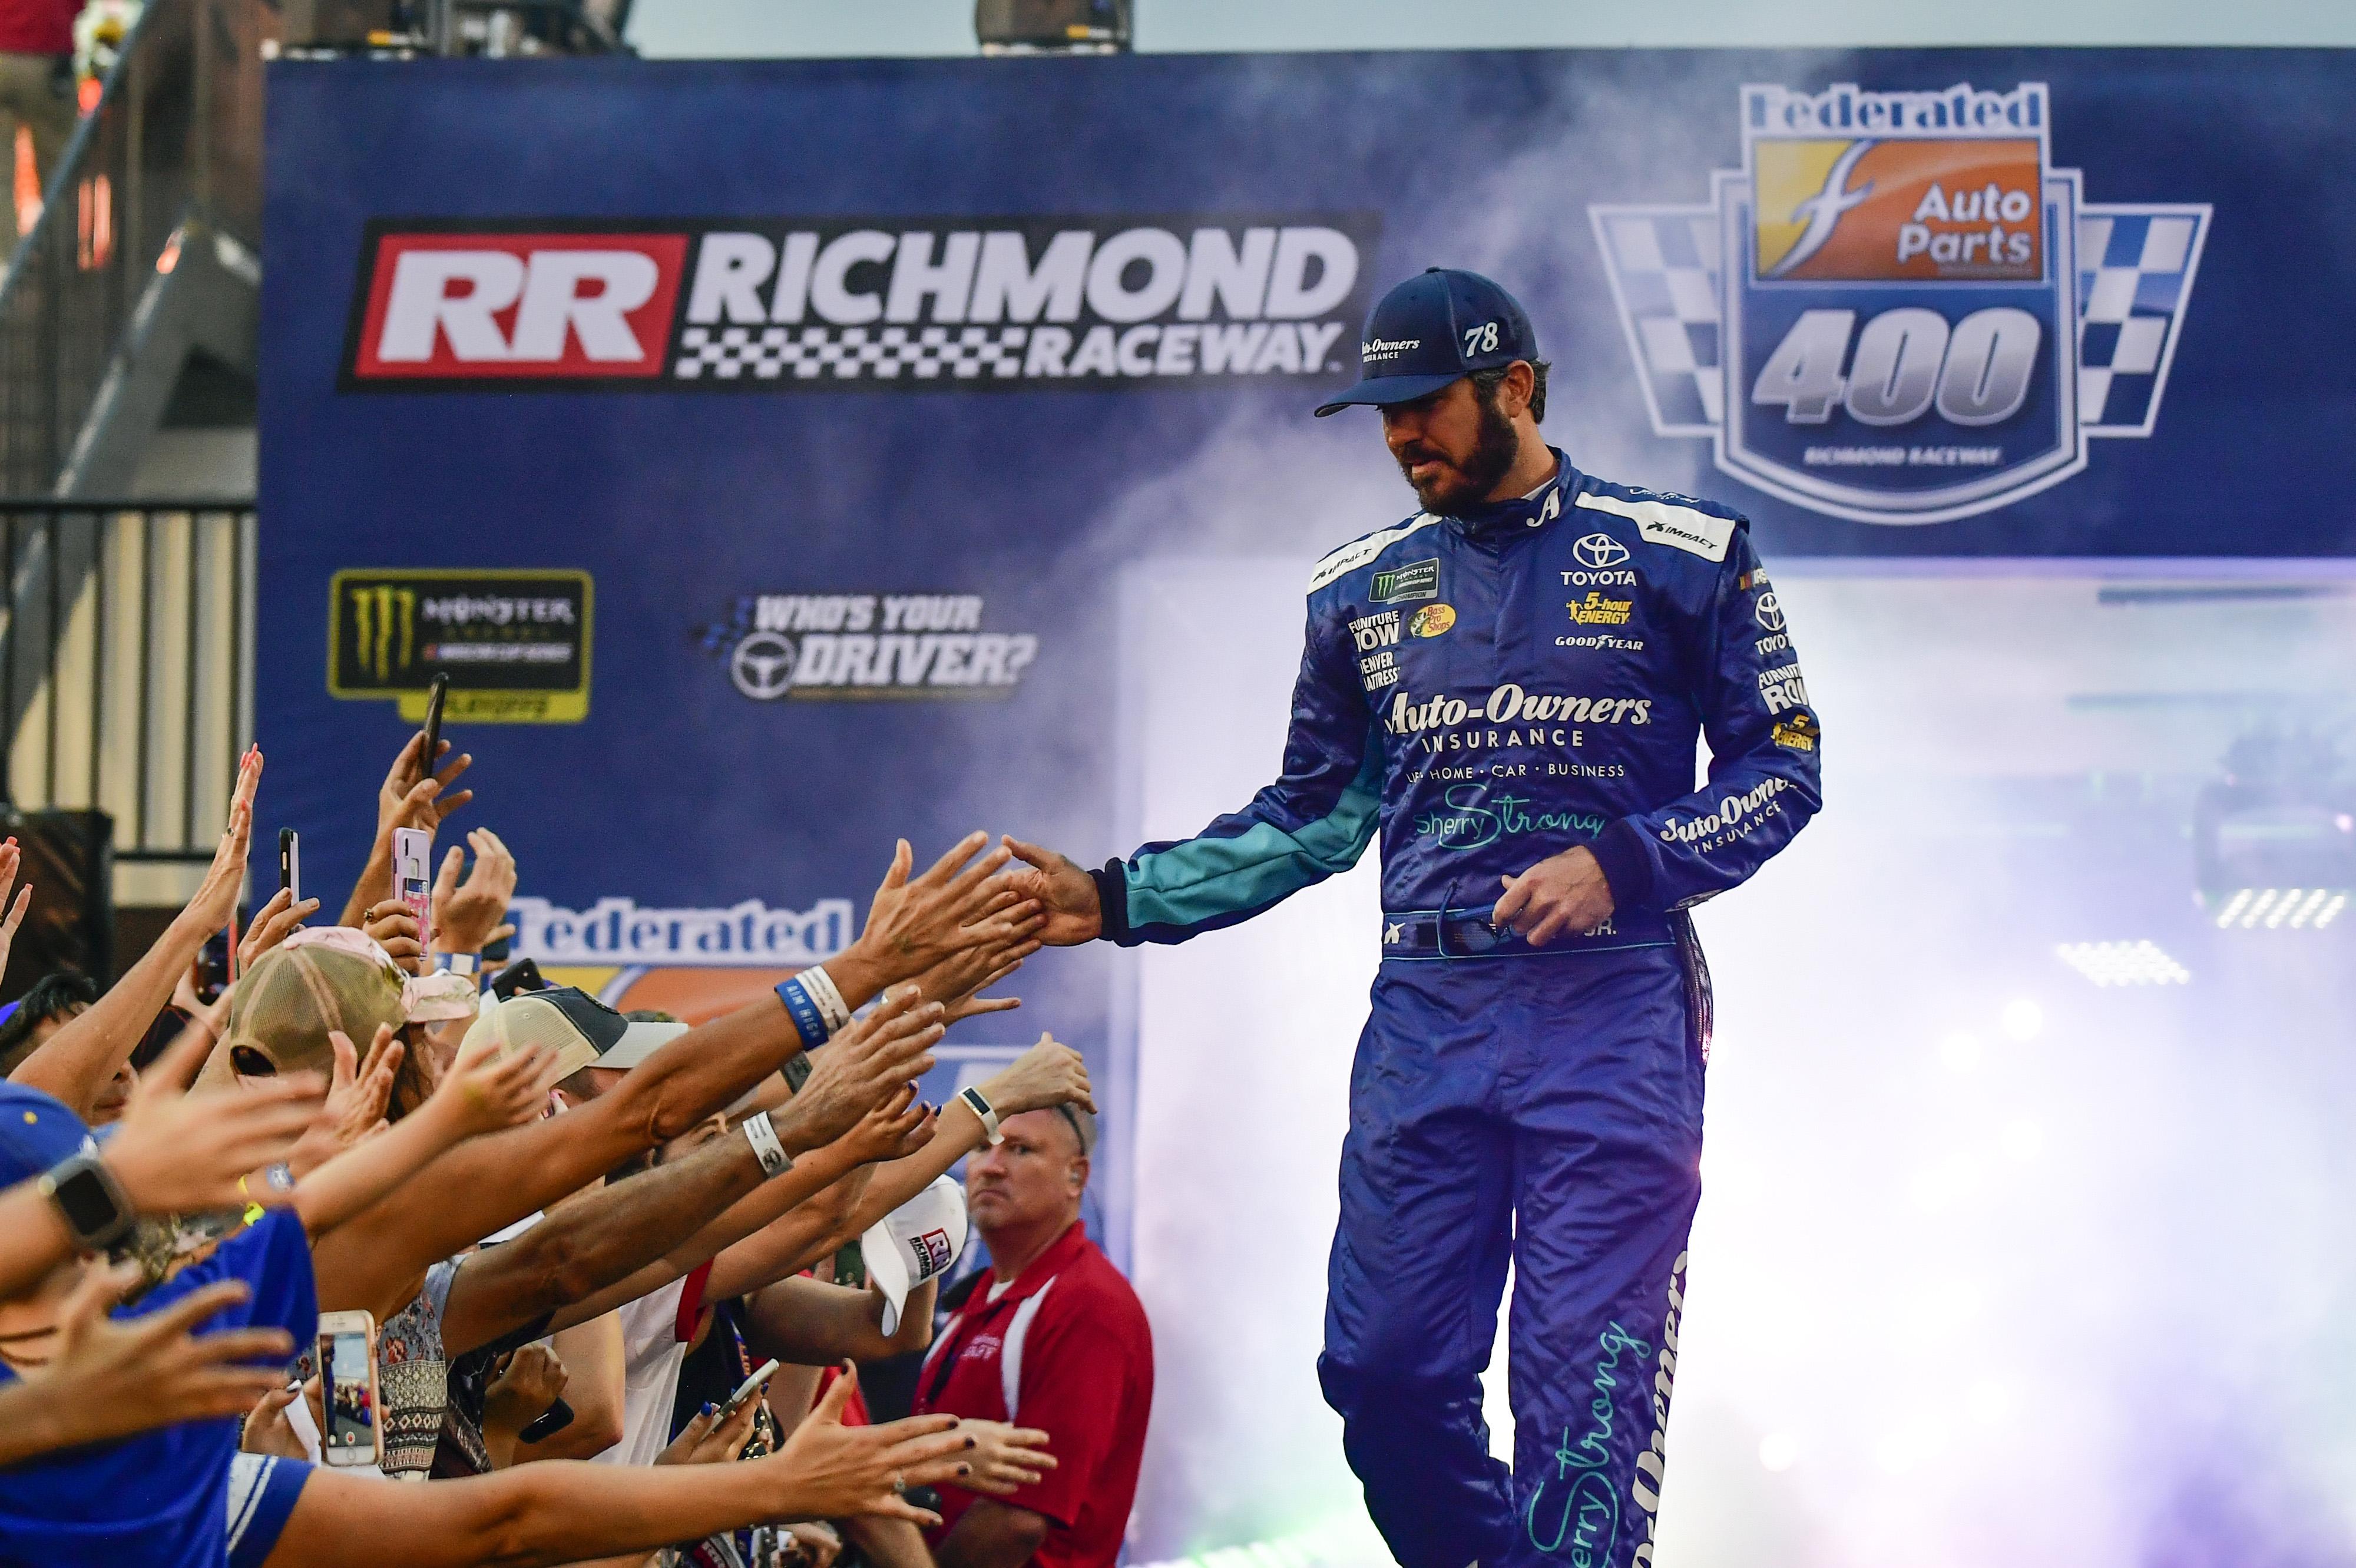 Richmond-racing-NASCAR